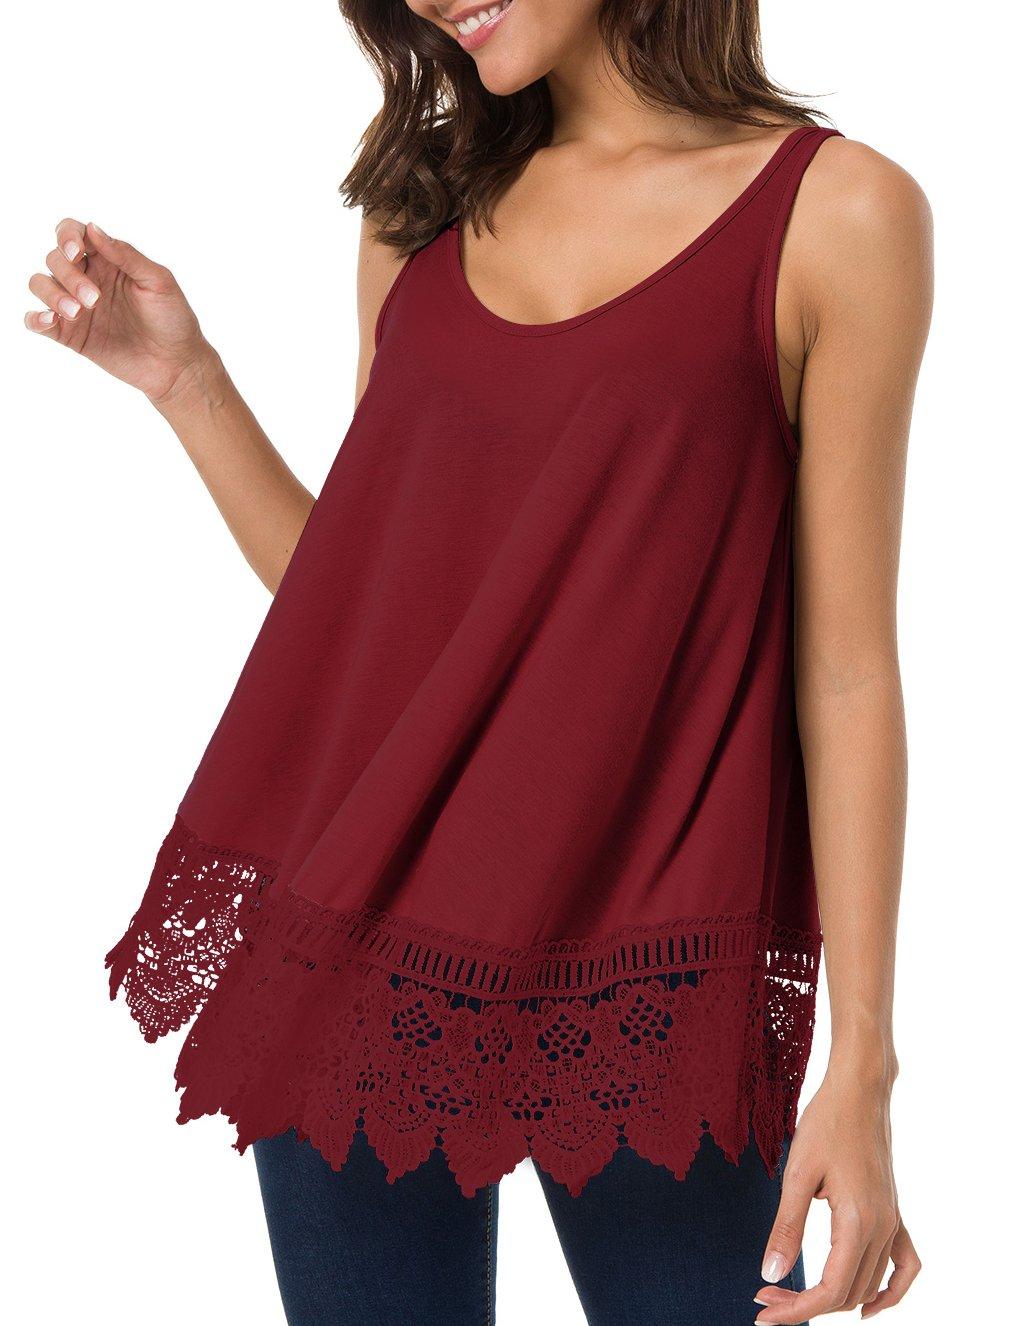 T.SEBAN Womens Tops, Sleeveless Summer Tops Shirt Lace Casual Loose Tank Tops for Women